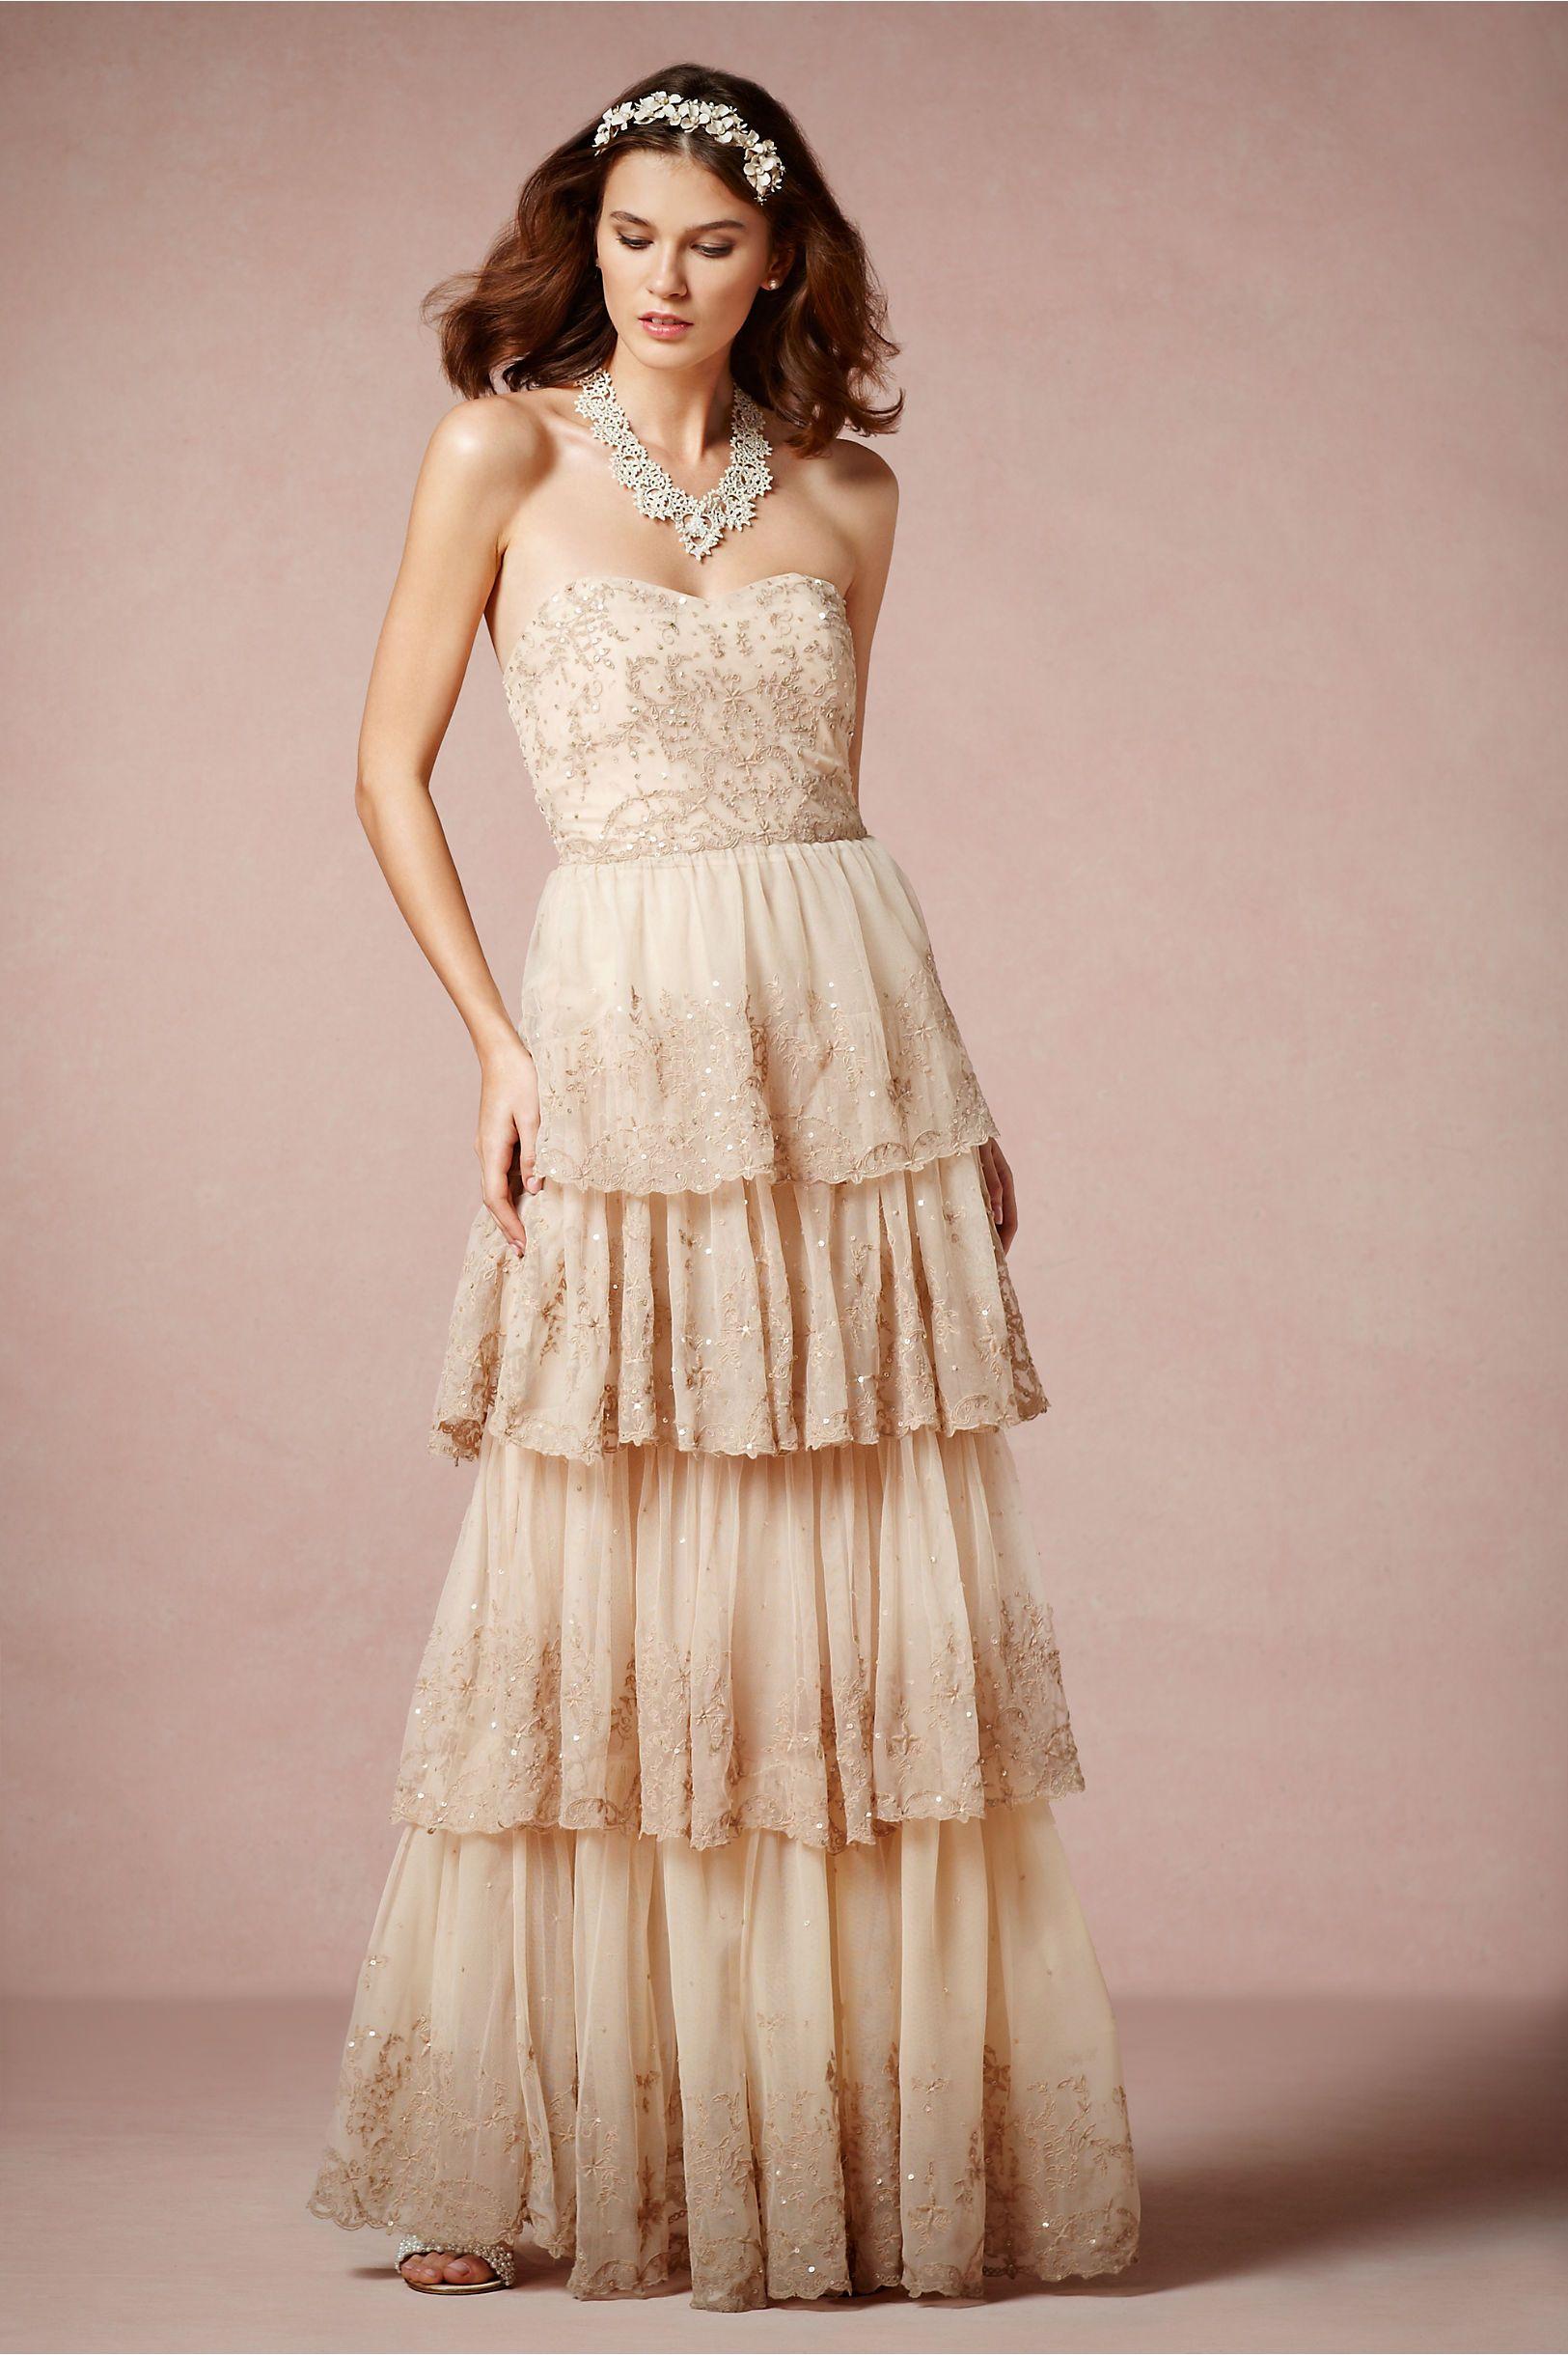 Rosecliff Gown from BHLDN | Weddin\' | Pinterest | Gowns, Wedding ...